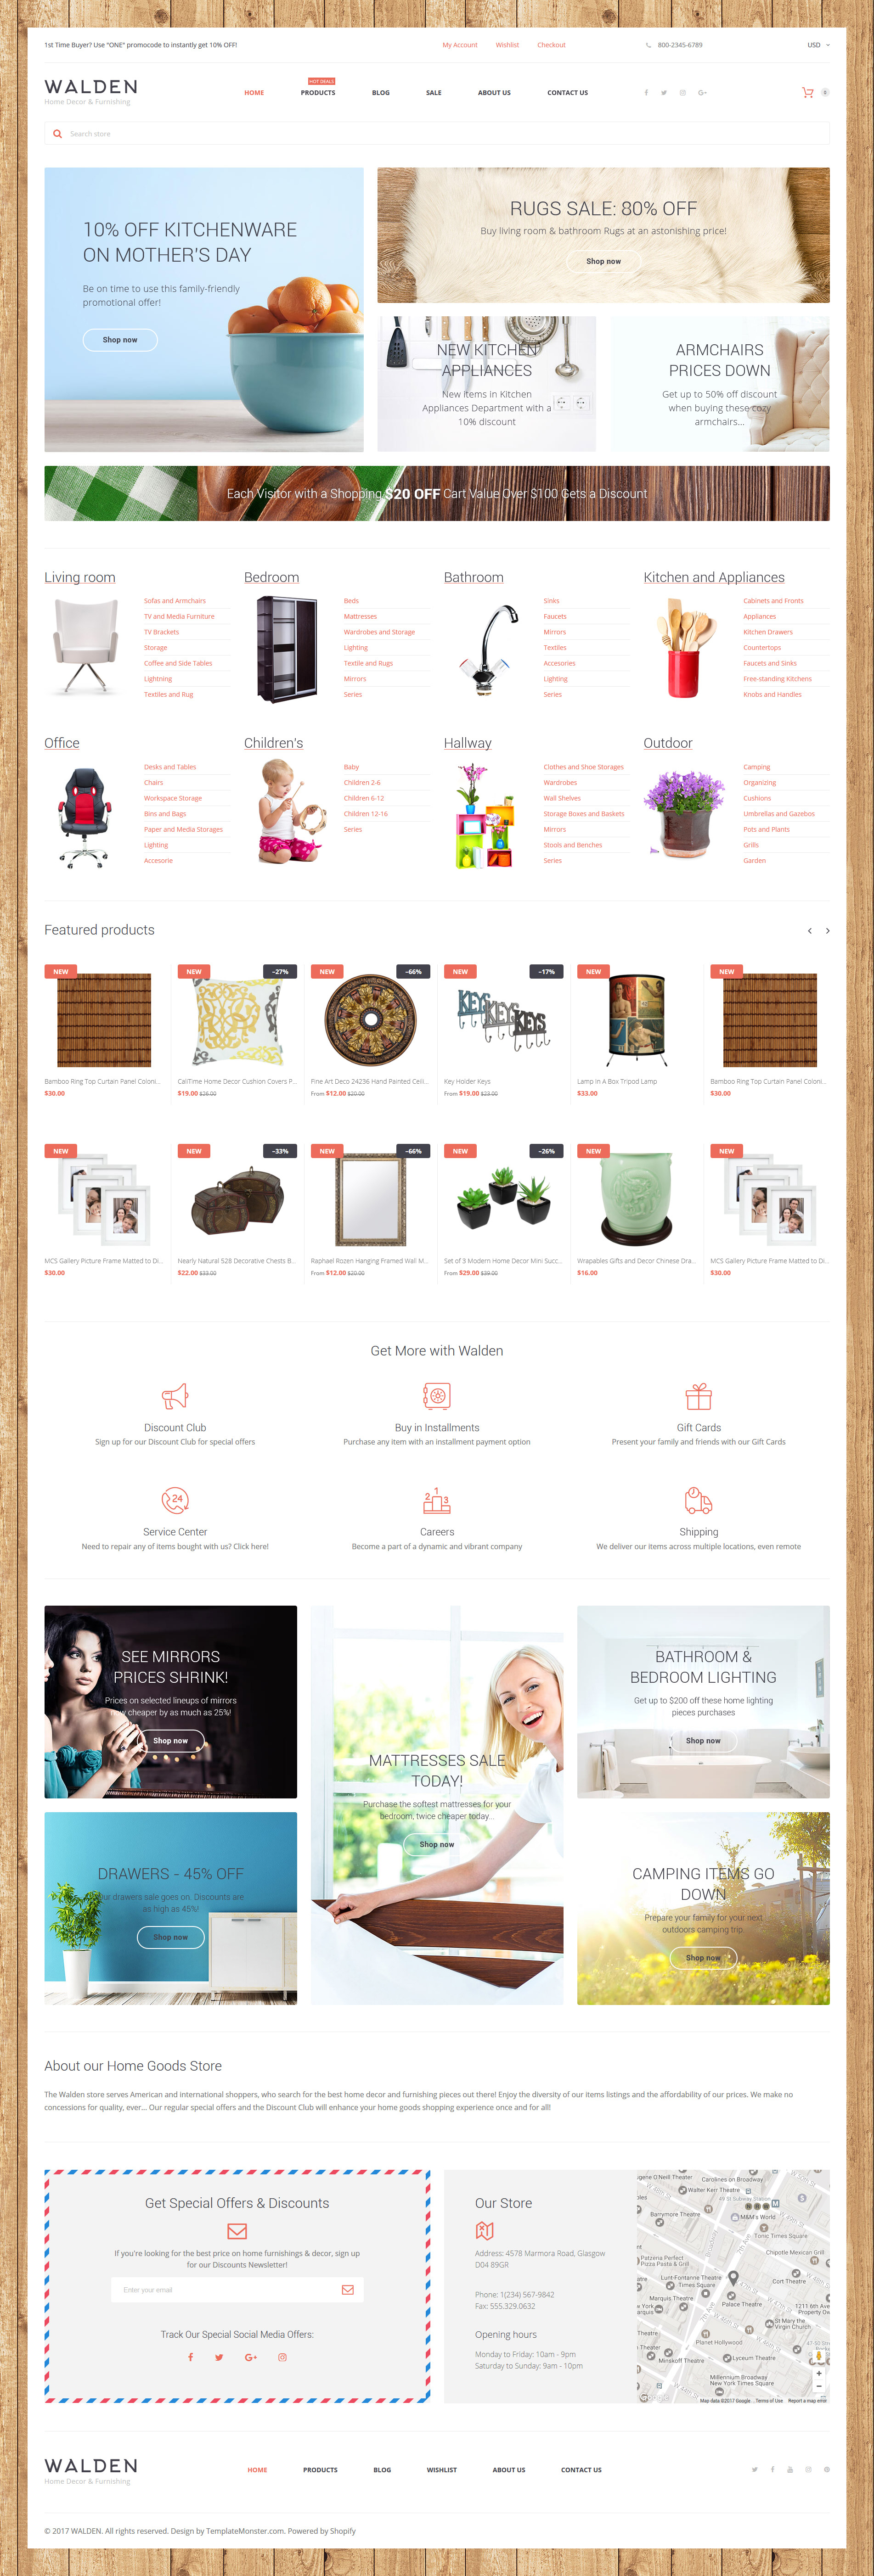 Reszponzív Home Decor & Furnishing Online Supermarket Shopify sablon 62325